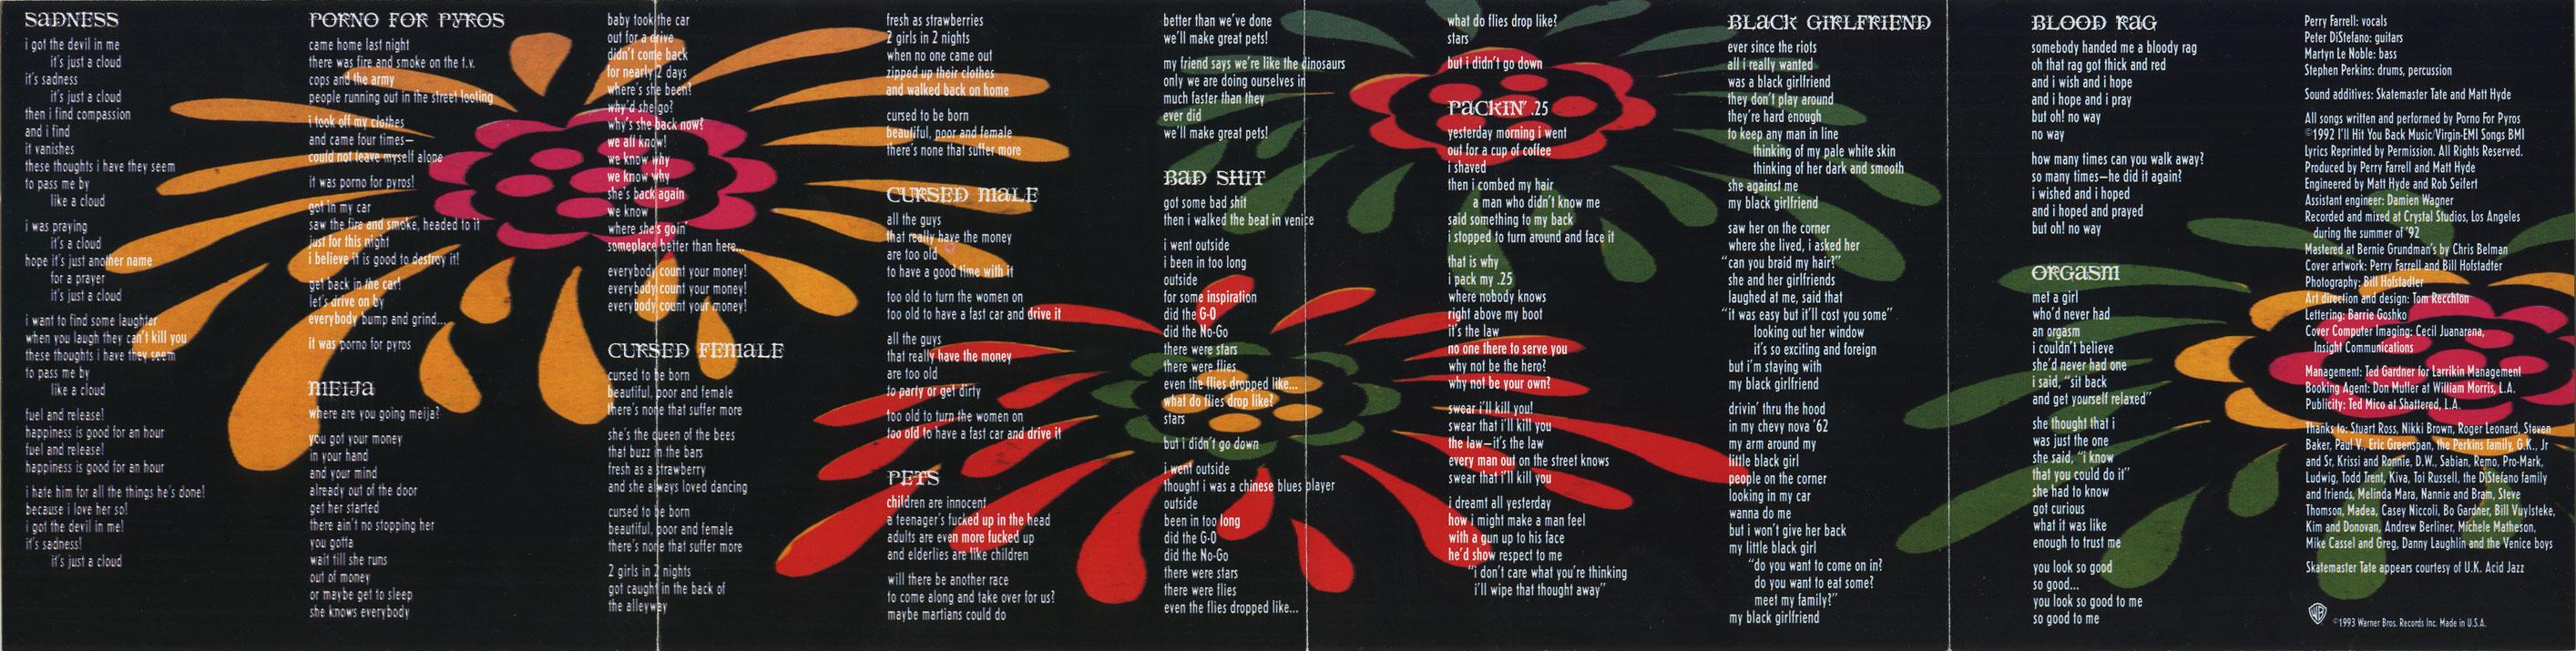 lyrics-porno-for-pyros